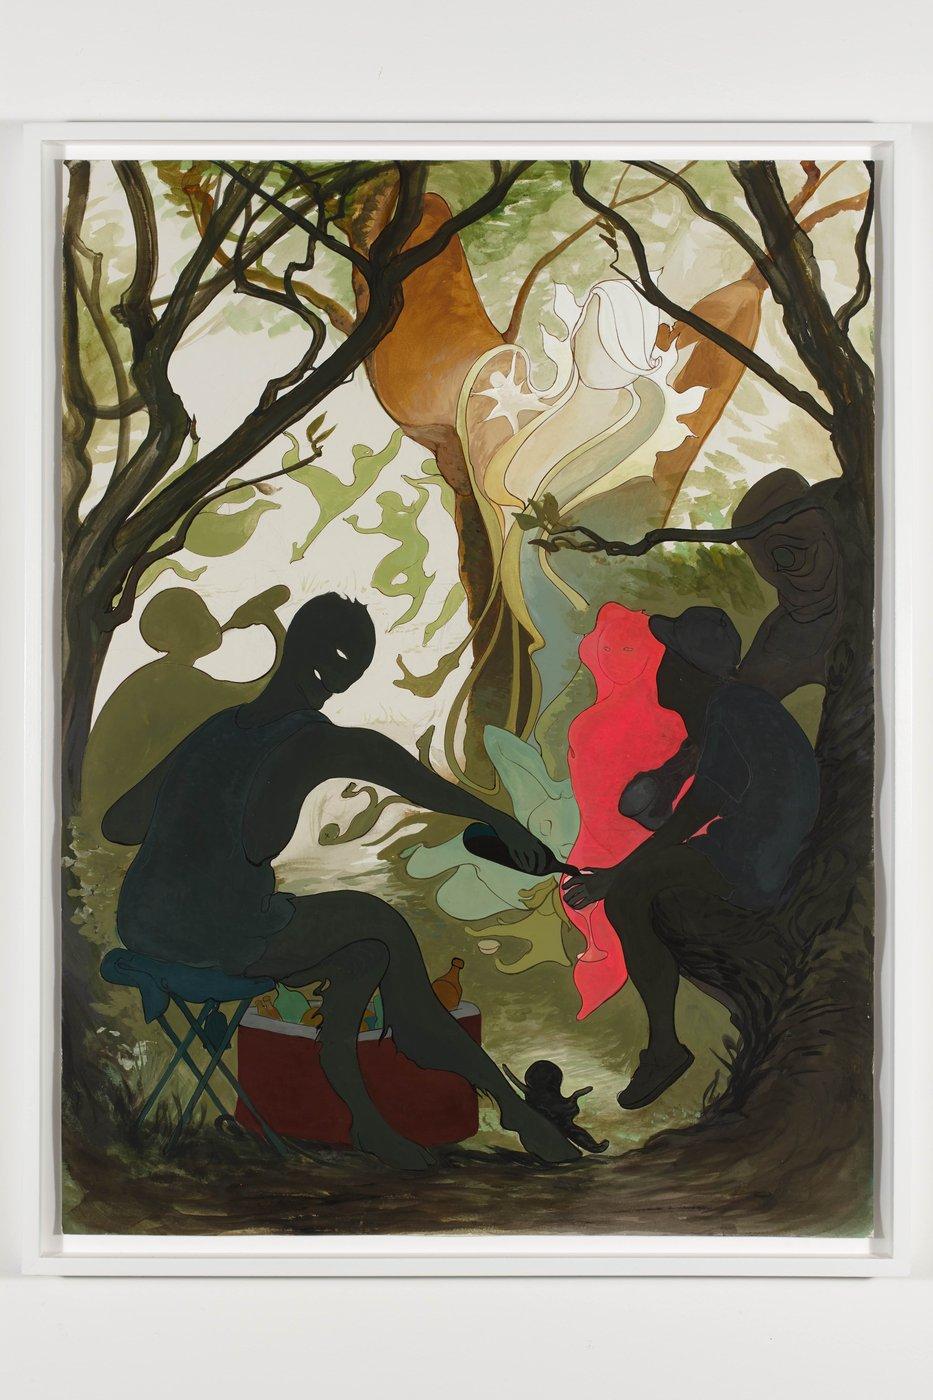 01. Inka Essenhigh - Untitled, 2015